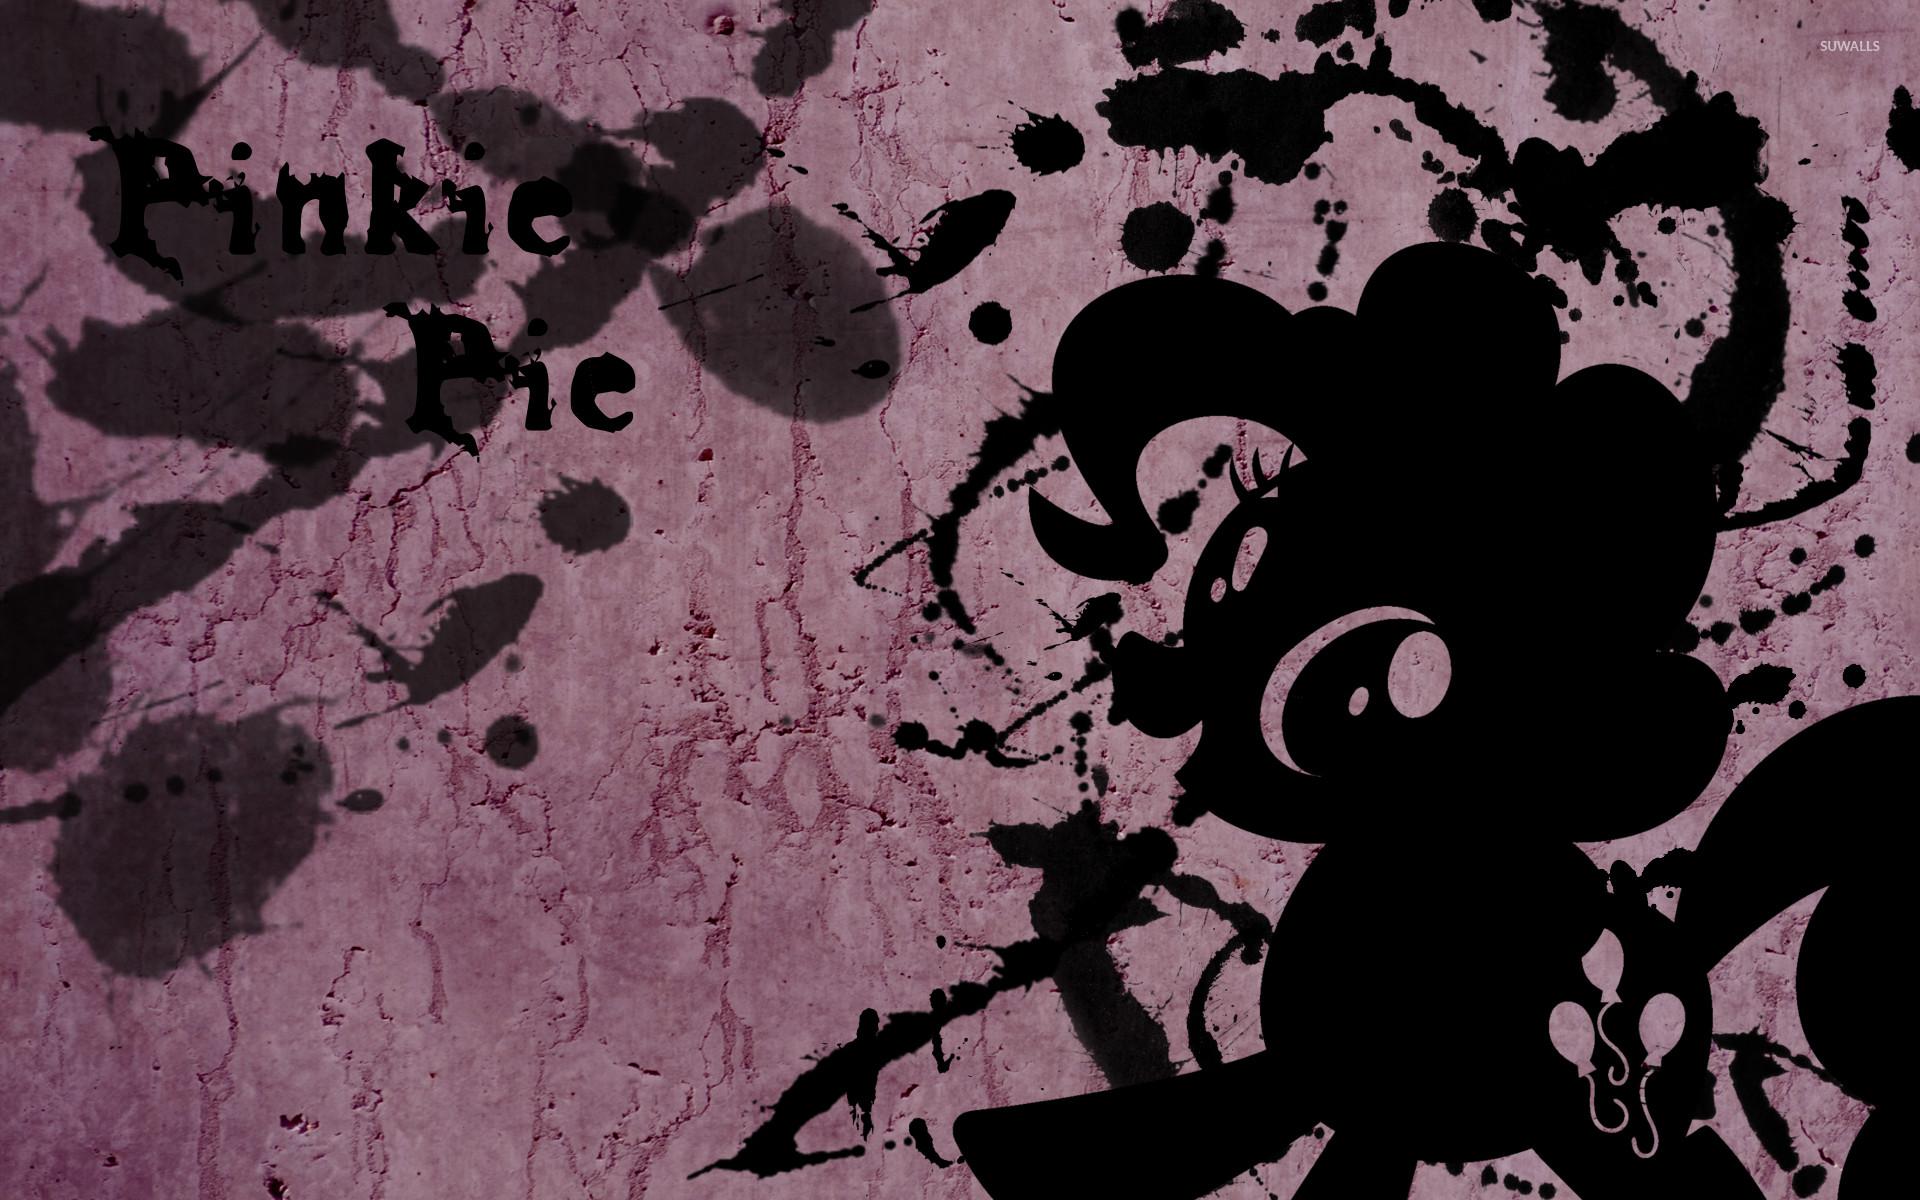 1920x1080 Epic Pony Wallpaper Chrissy My Little